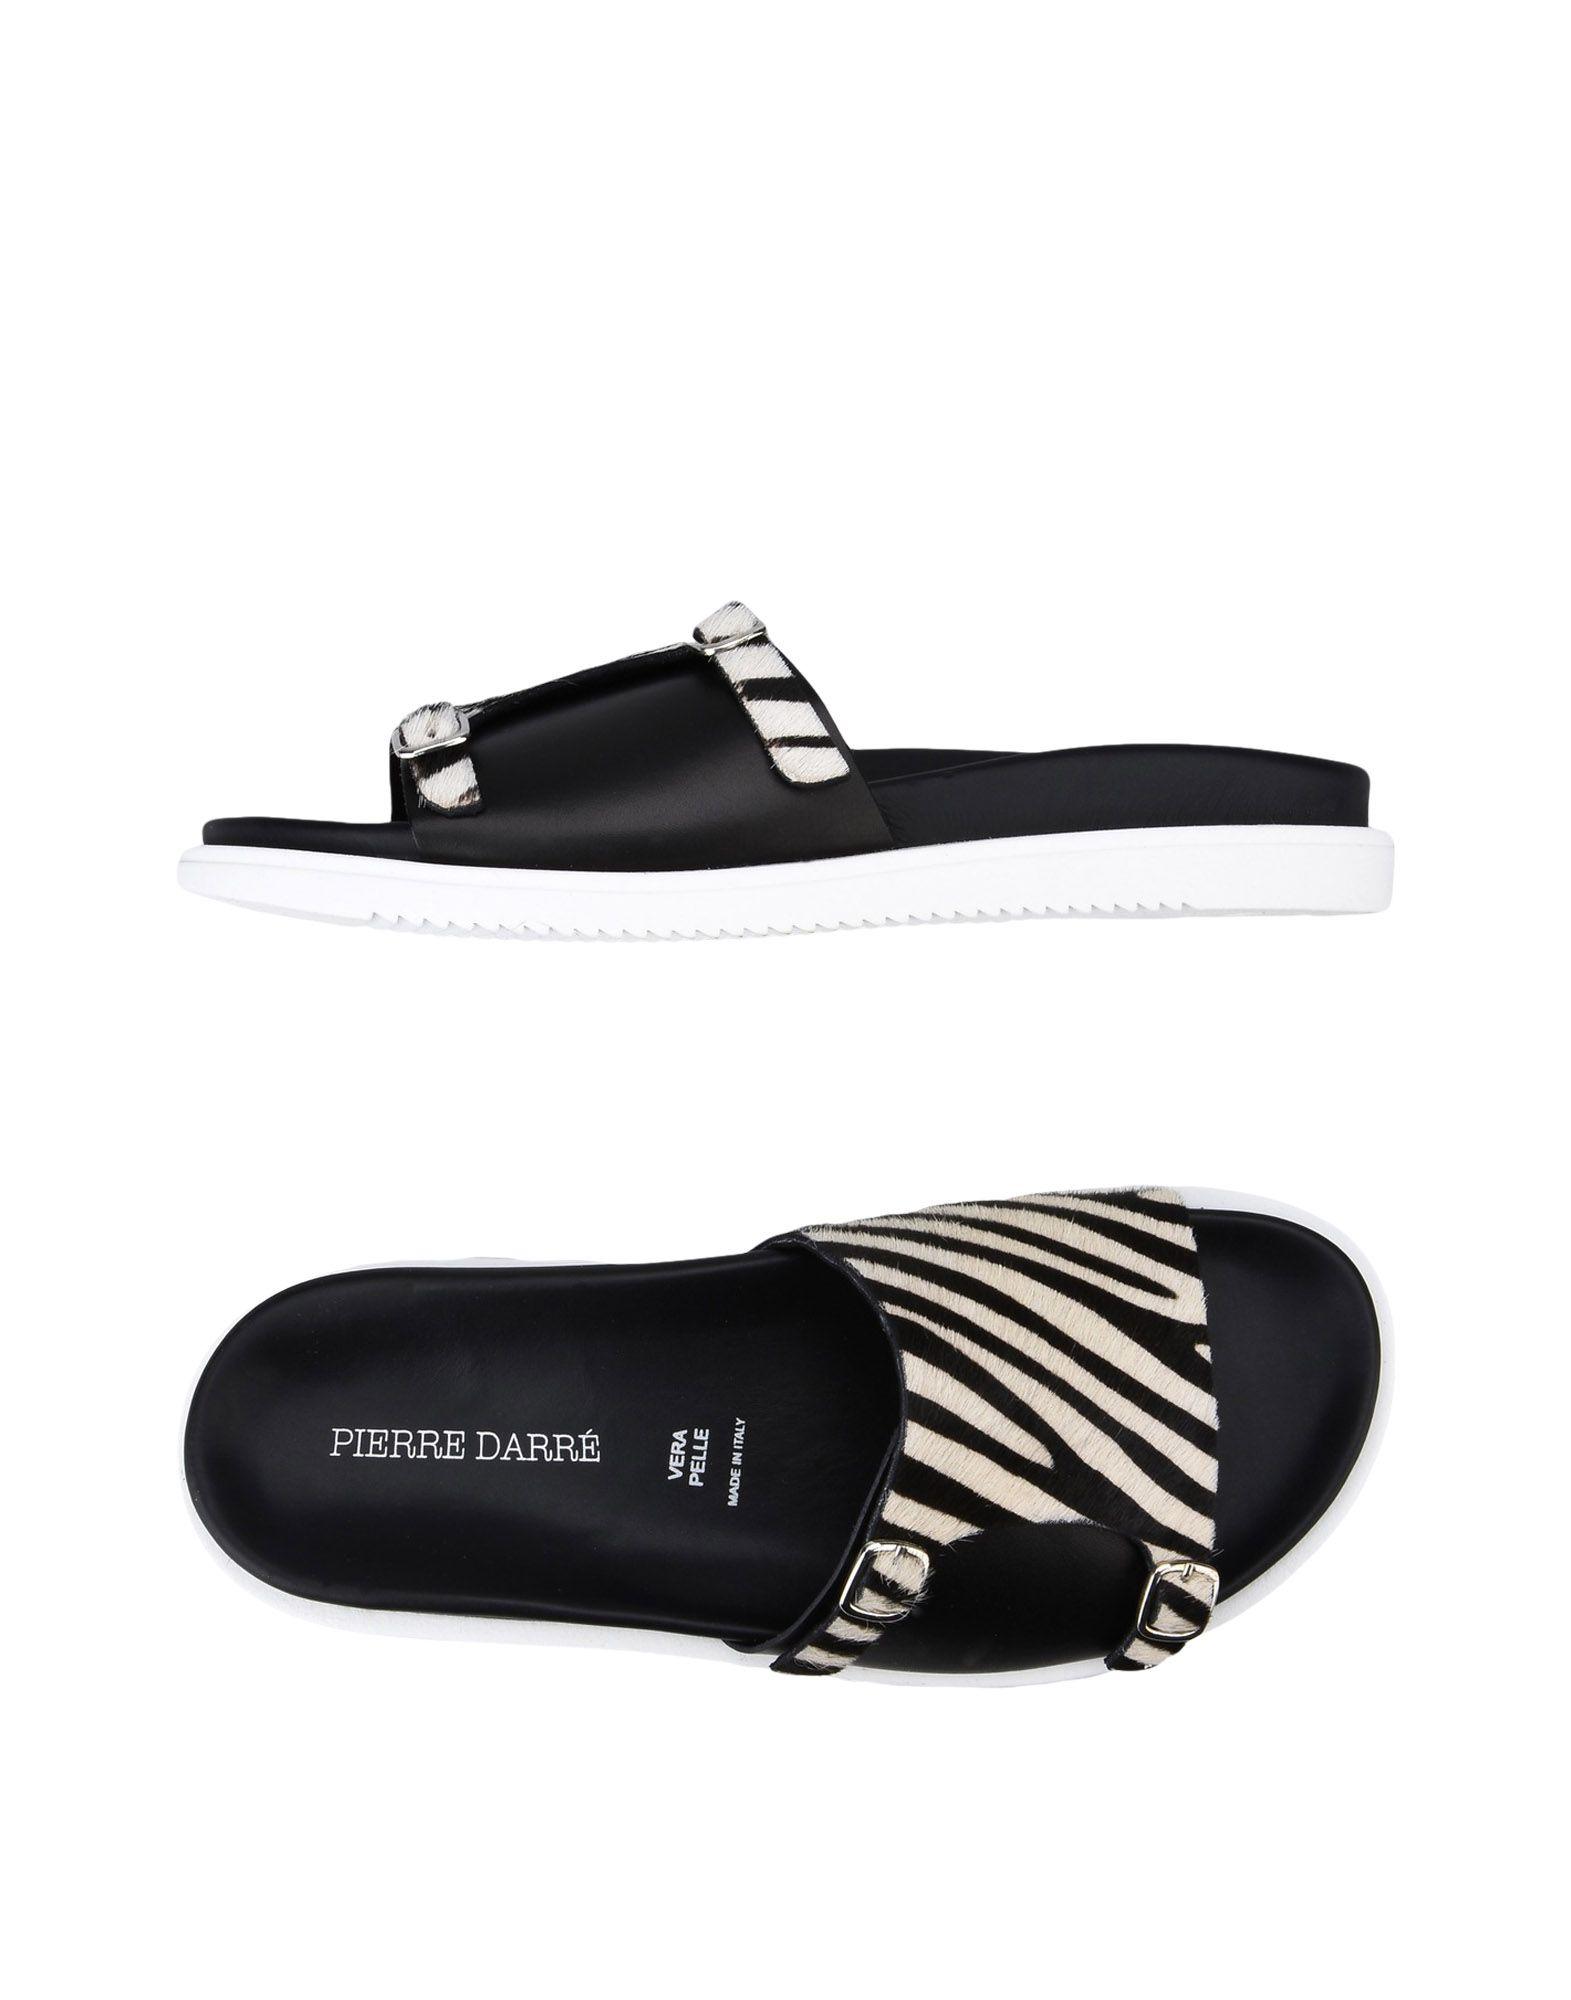 Pierre Darré Sandalen Damen  11226932RC Gute Qualität beliebte Schuhe